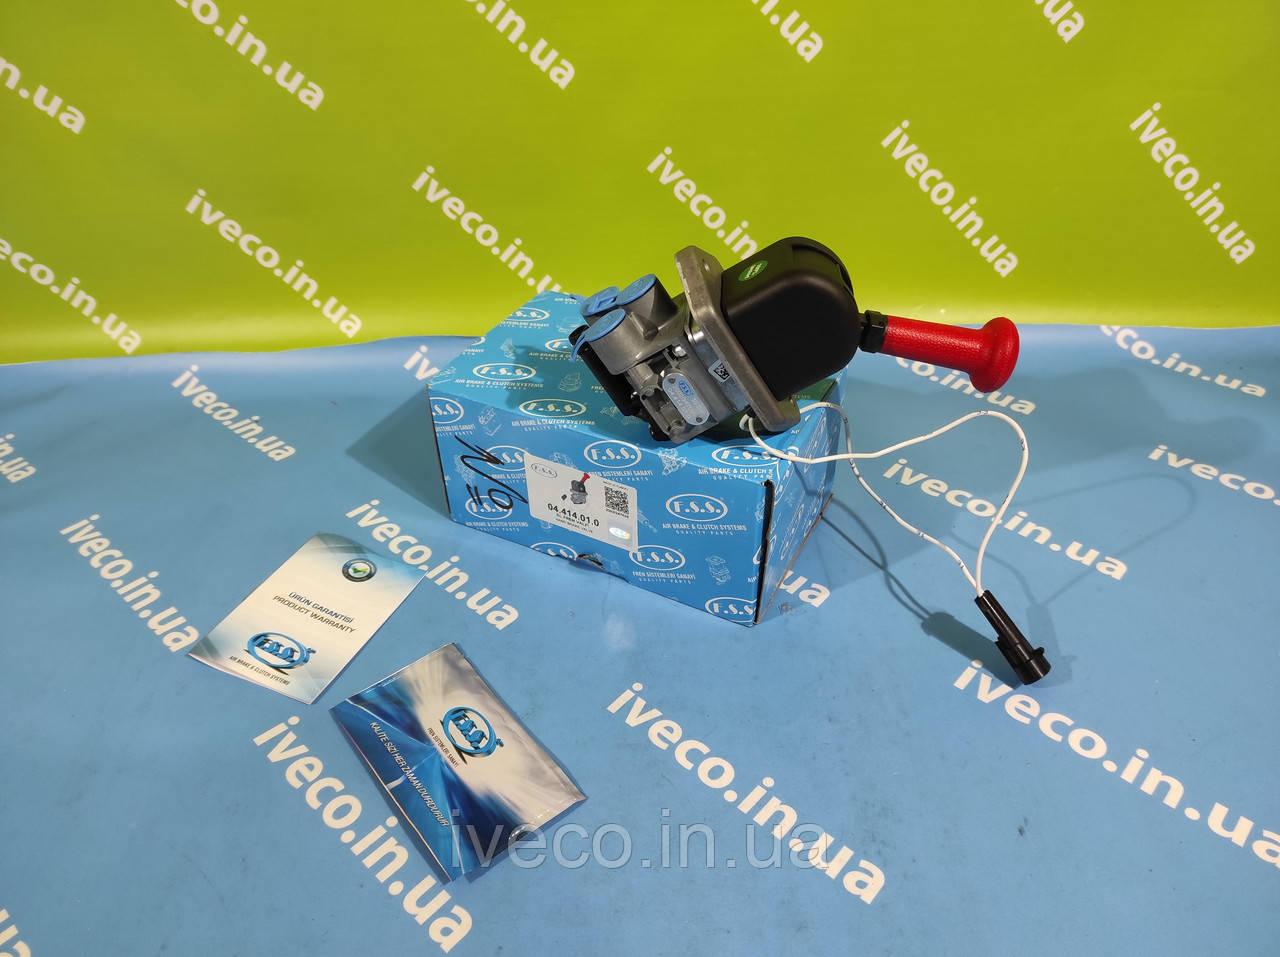 Кран ручника кран стояночного тормоза Iveco Stralis Trakker EuroCargo 41211127 500303741 DPM95AAX 98405732